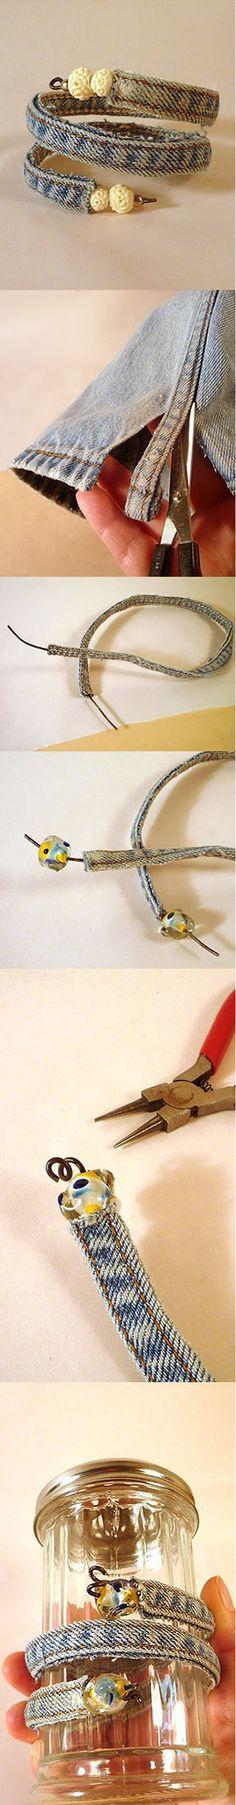 Diy Cool Jean Bracelet | DIY & Crafts